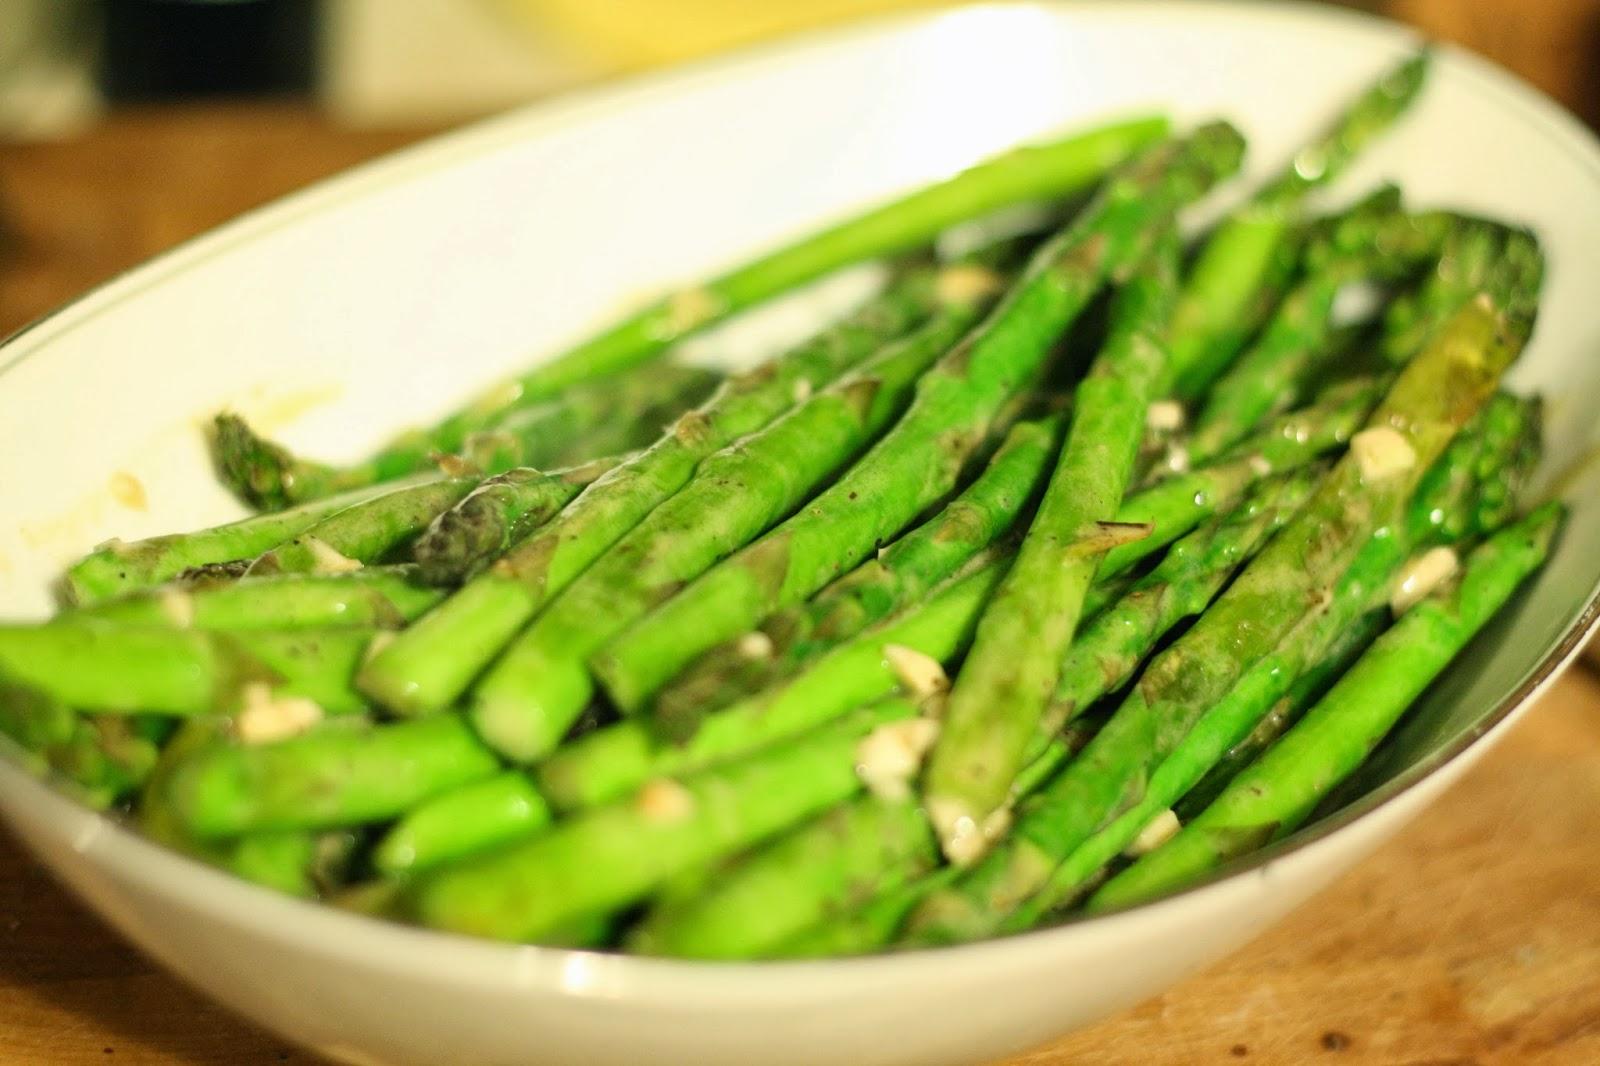 ... Gospel According to Ruth: Sauteed Asparagus with Dijon Vinaigrette